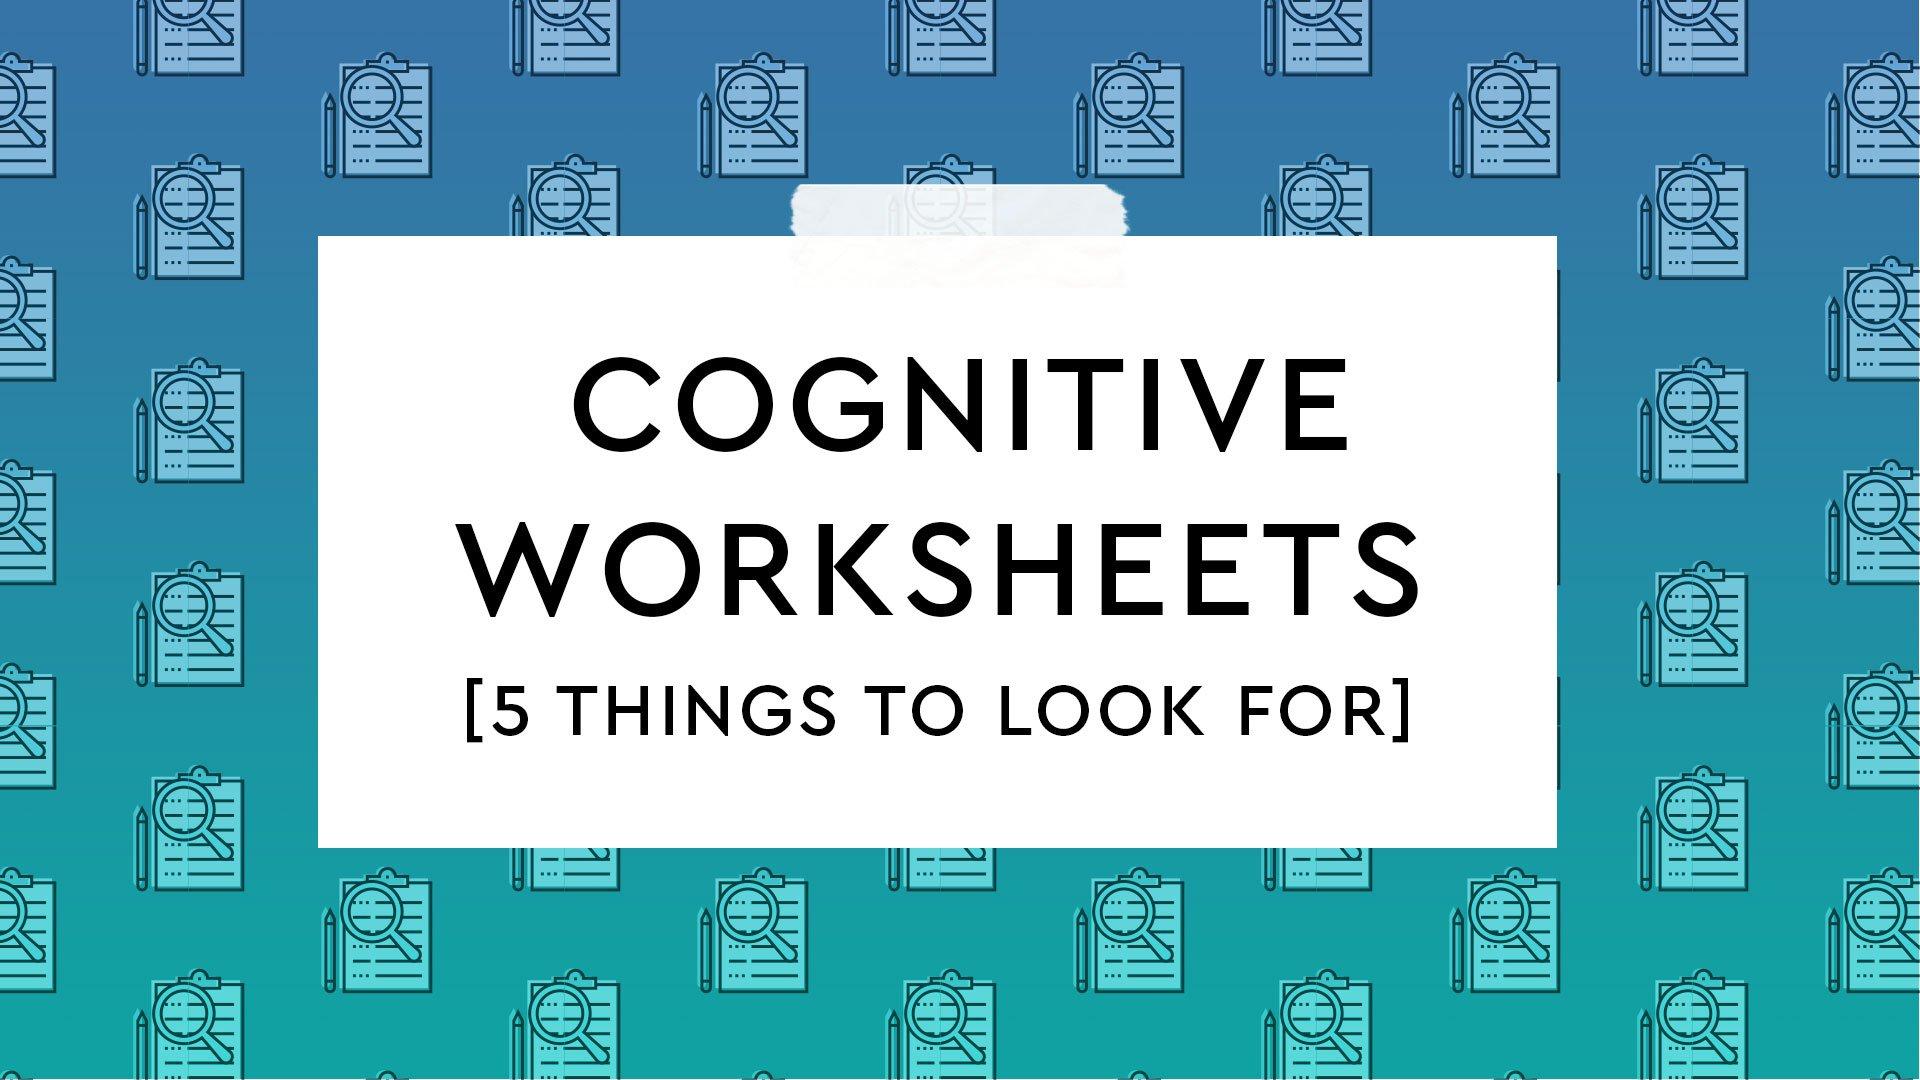 5 Characteristics Of Good Cognitive Worksheets